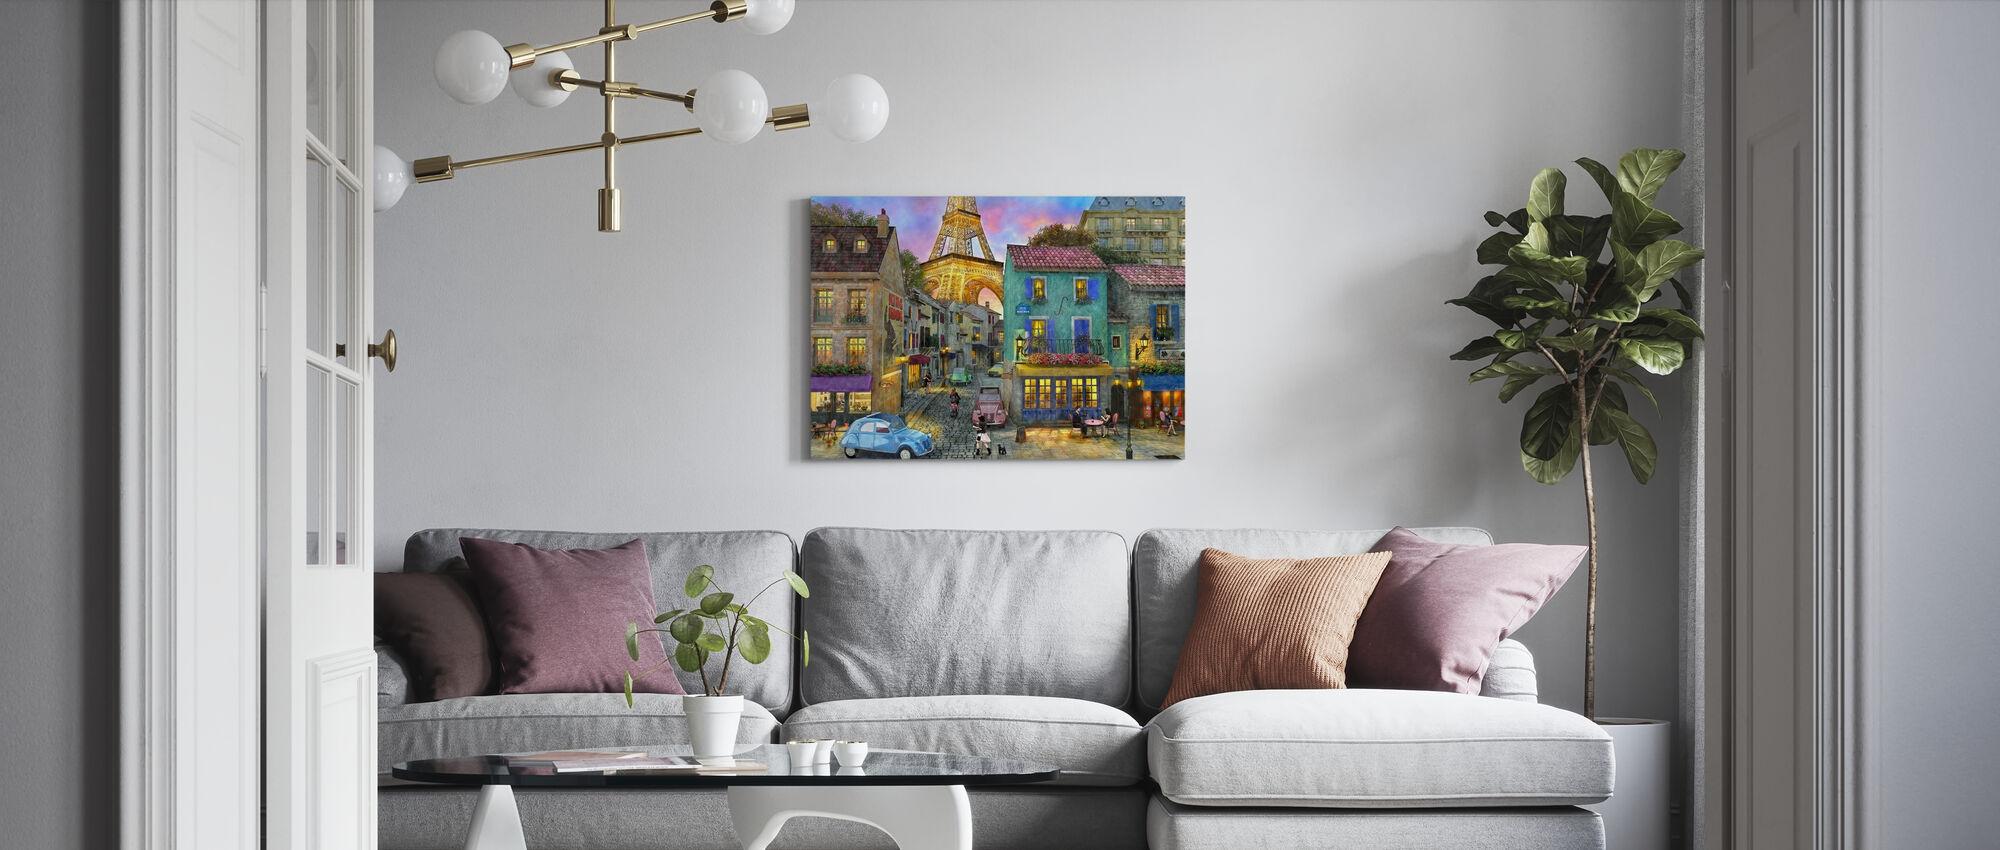 Paris gator - Canvastavla - Vardagsrum